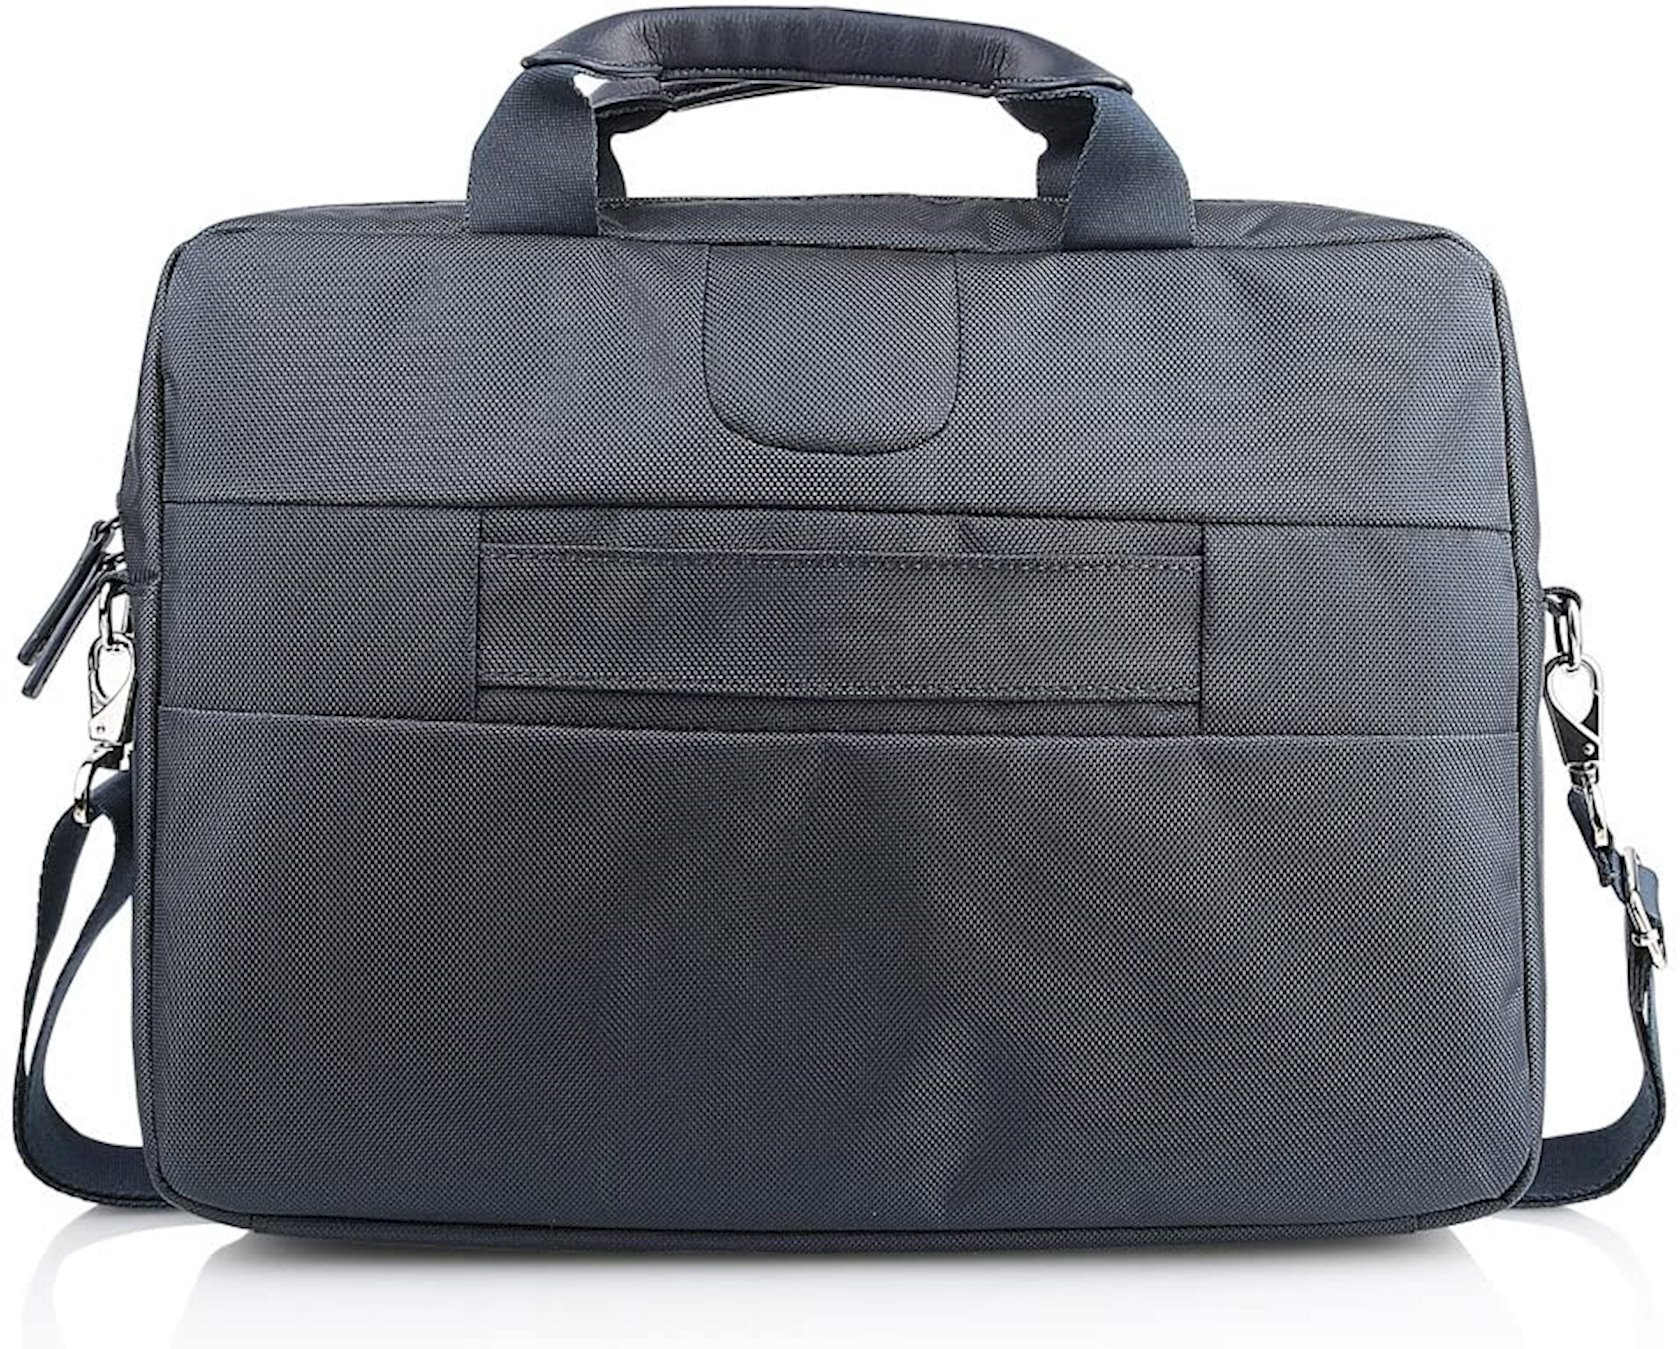 Noutbuk üçün çanta Lenovo 15.6 Classic Topload by NAVA Blue GX40M52030